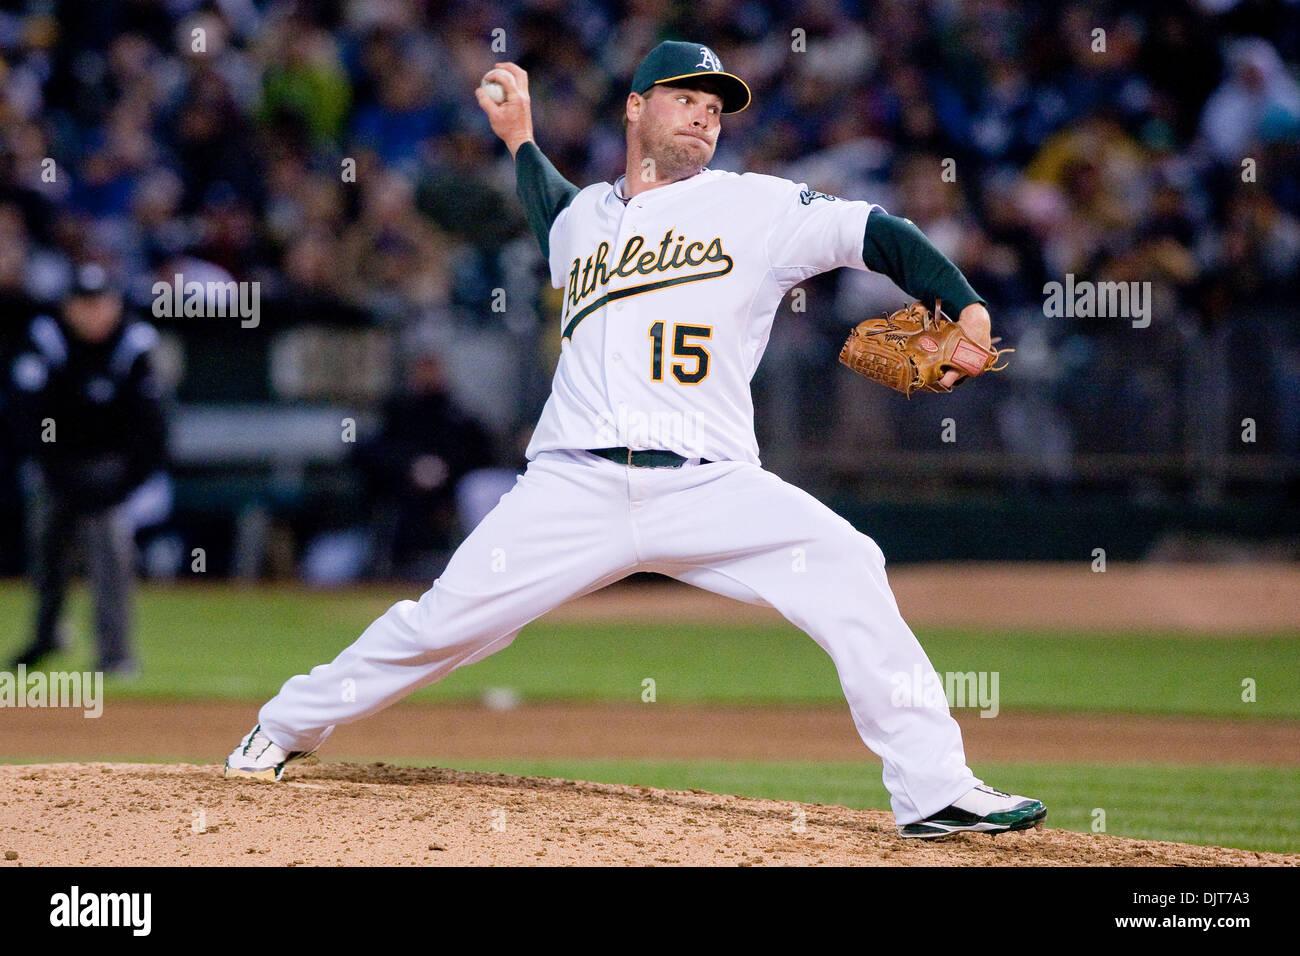 Oakland Calif Oakland Athletics P Ben Sheets 15 During Game Stock Photo 63227531 Alamy